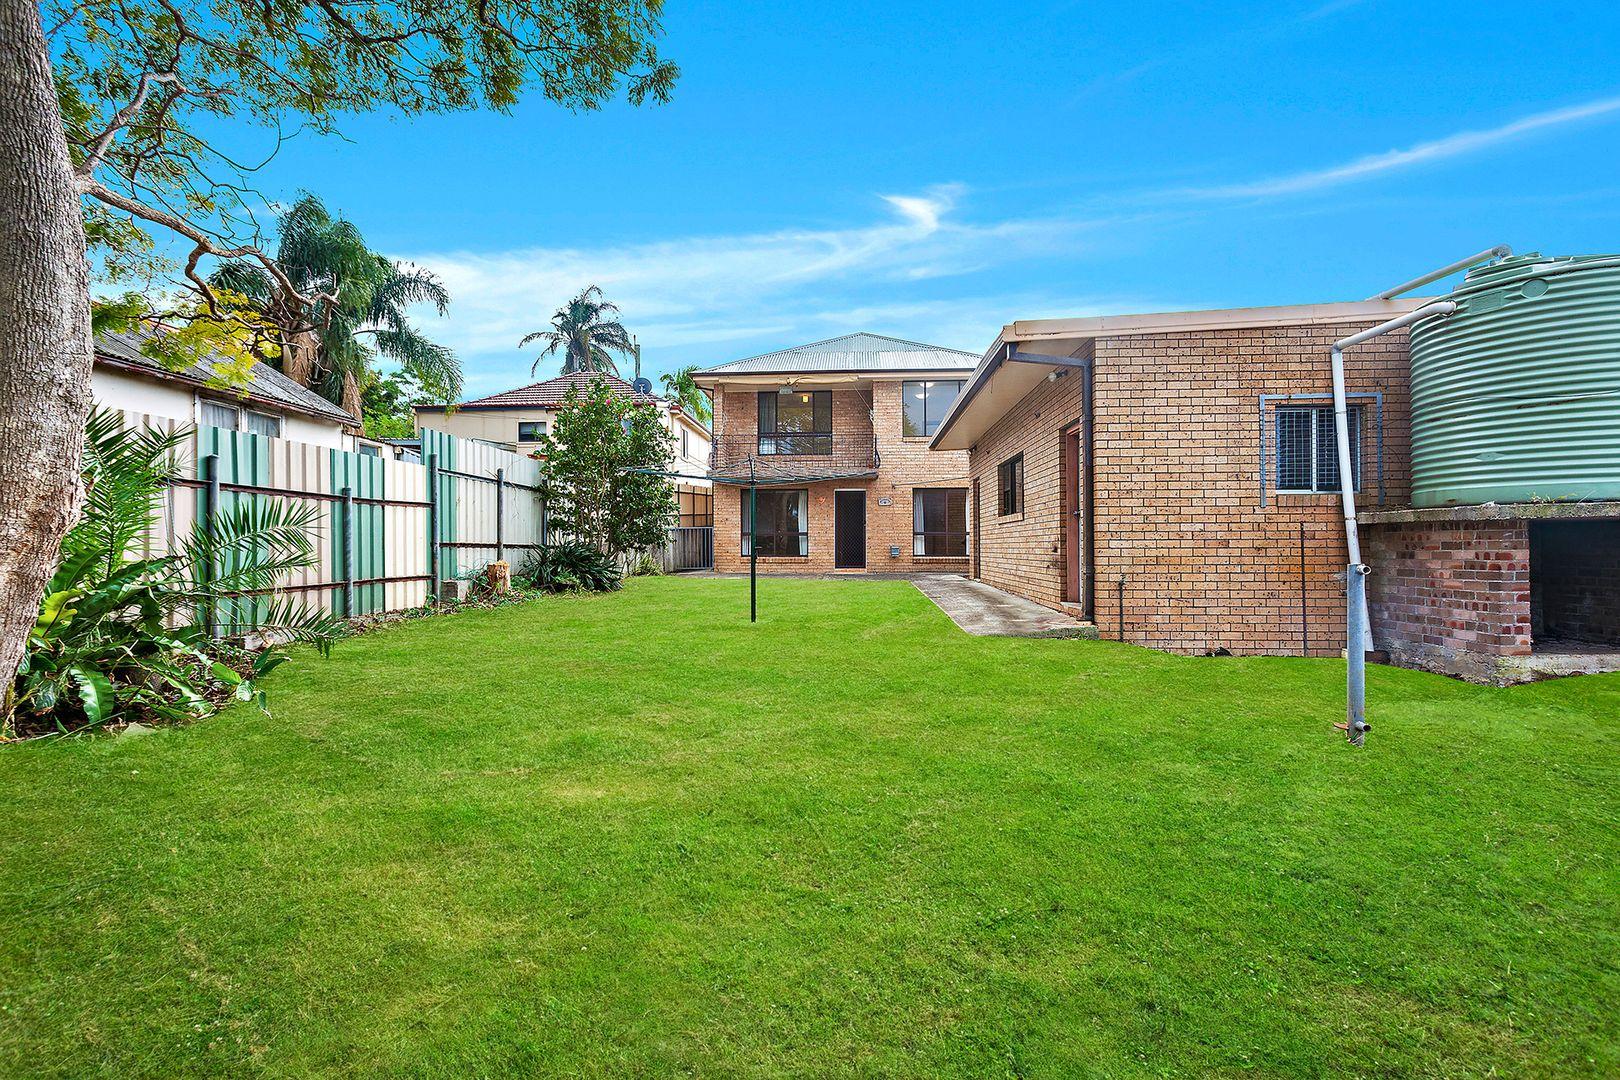 44 The Avenue, Corrimal NSW 2518, Image 0